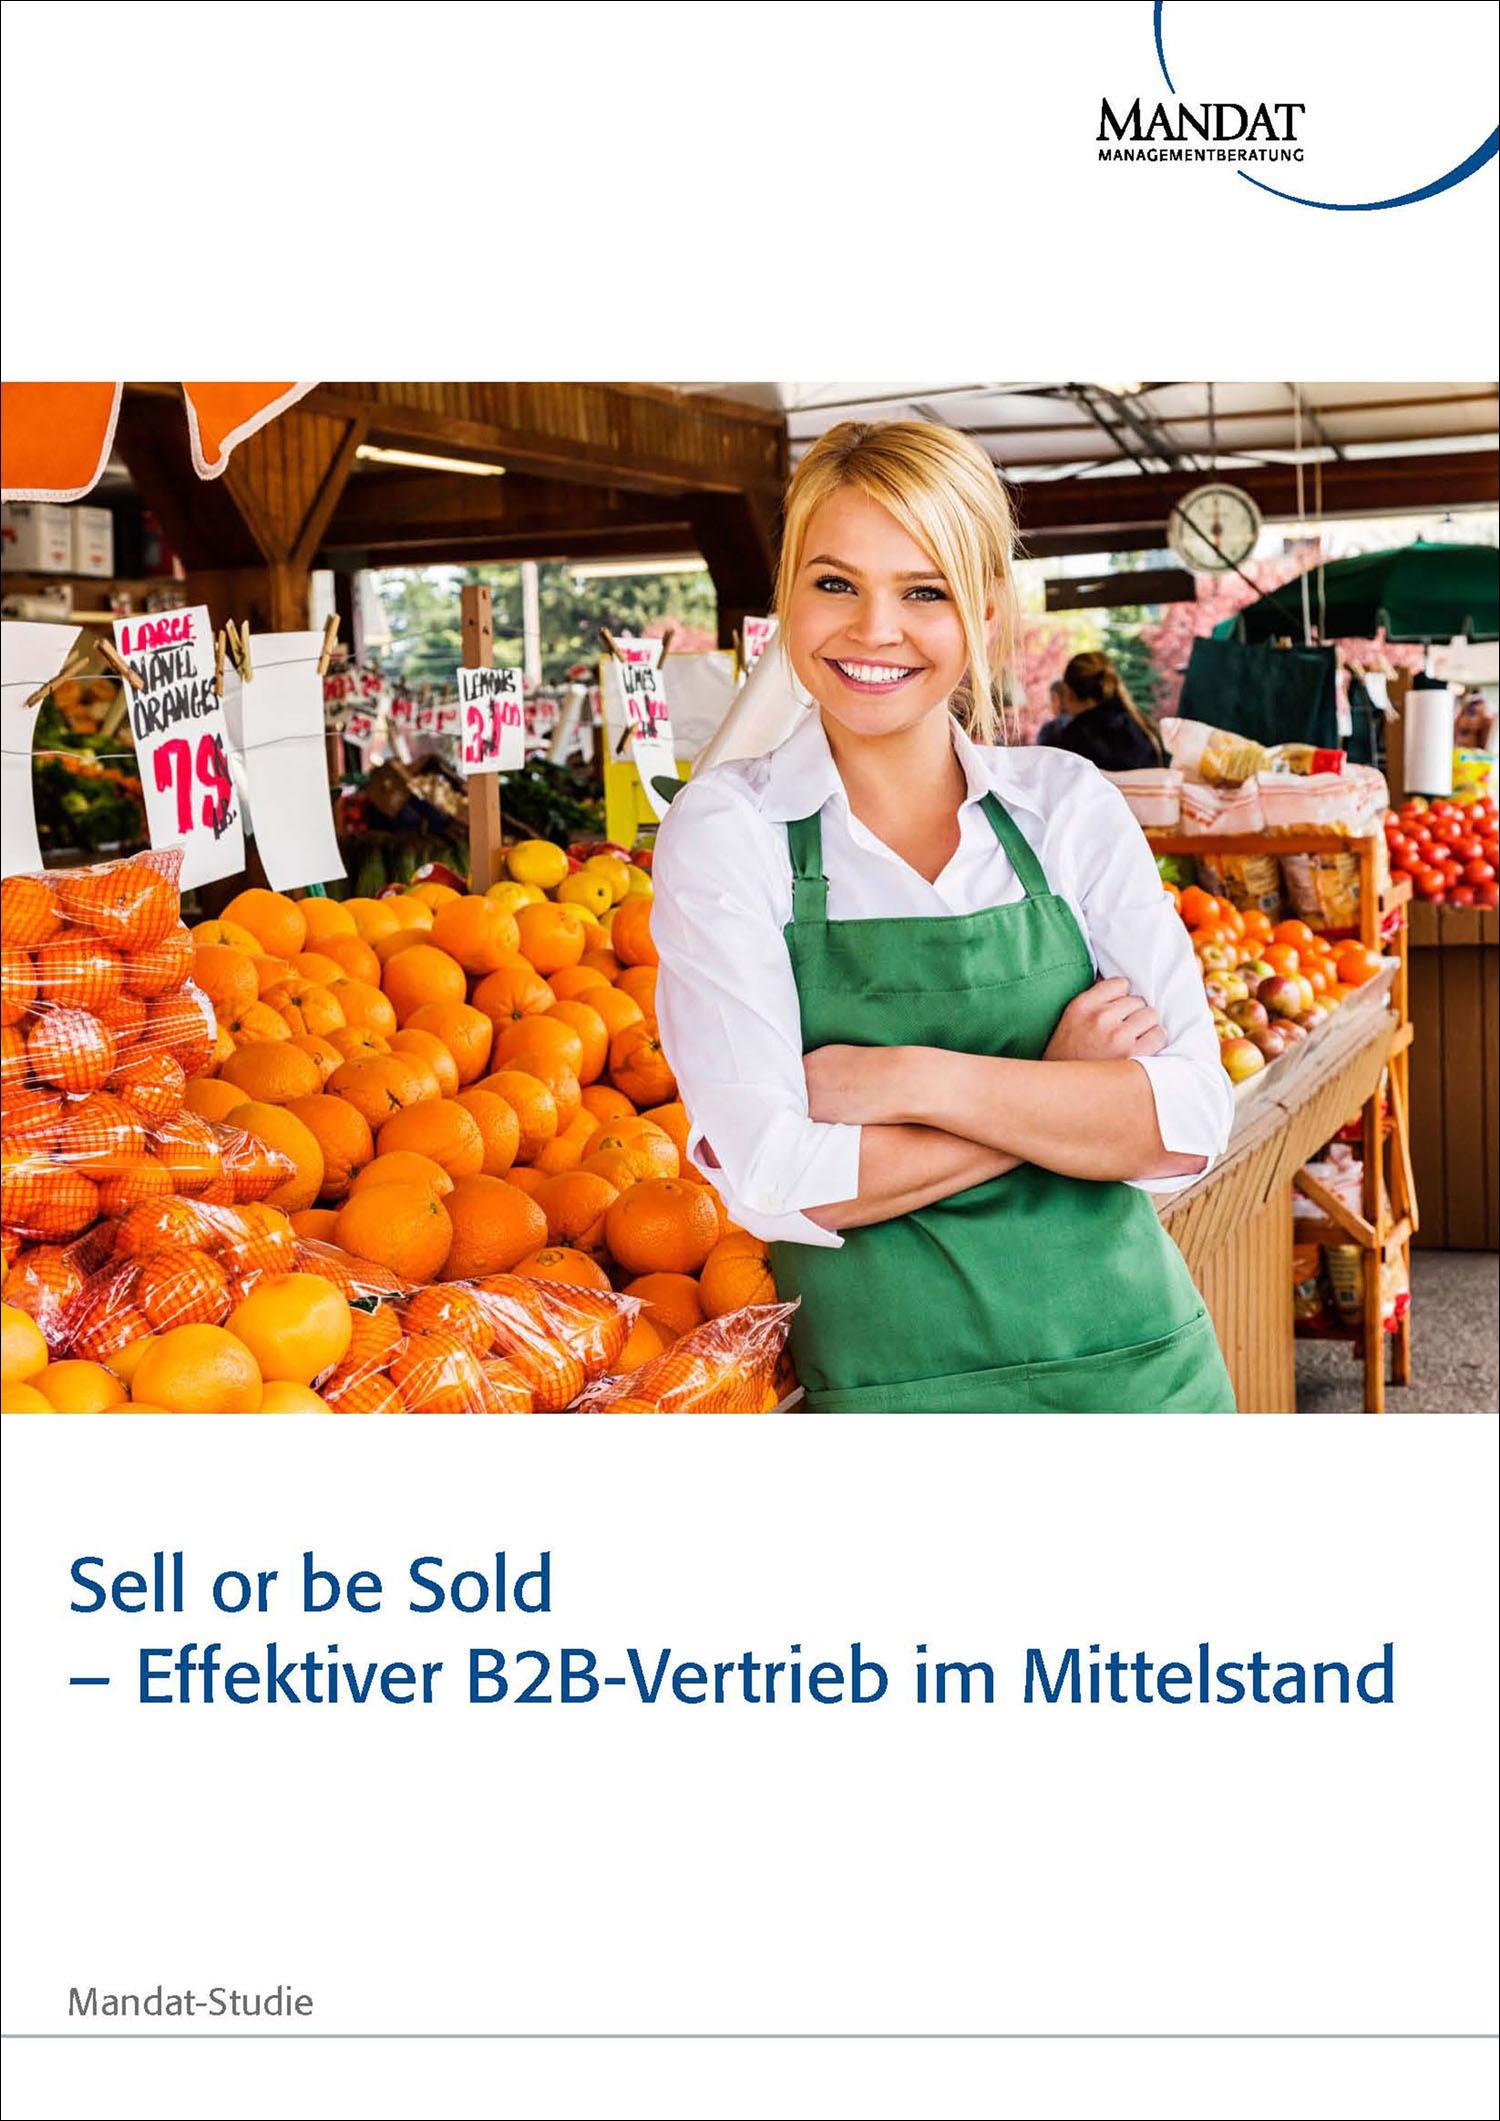 ell or be Sold – Effektiver B2B-Vertrieb im Mittelstand